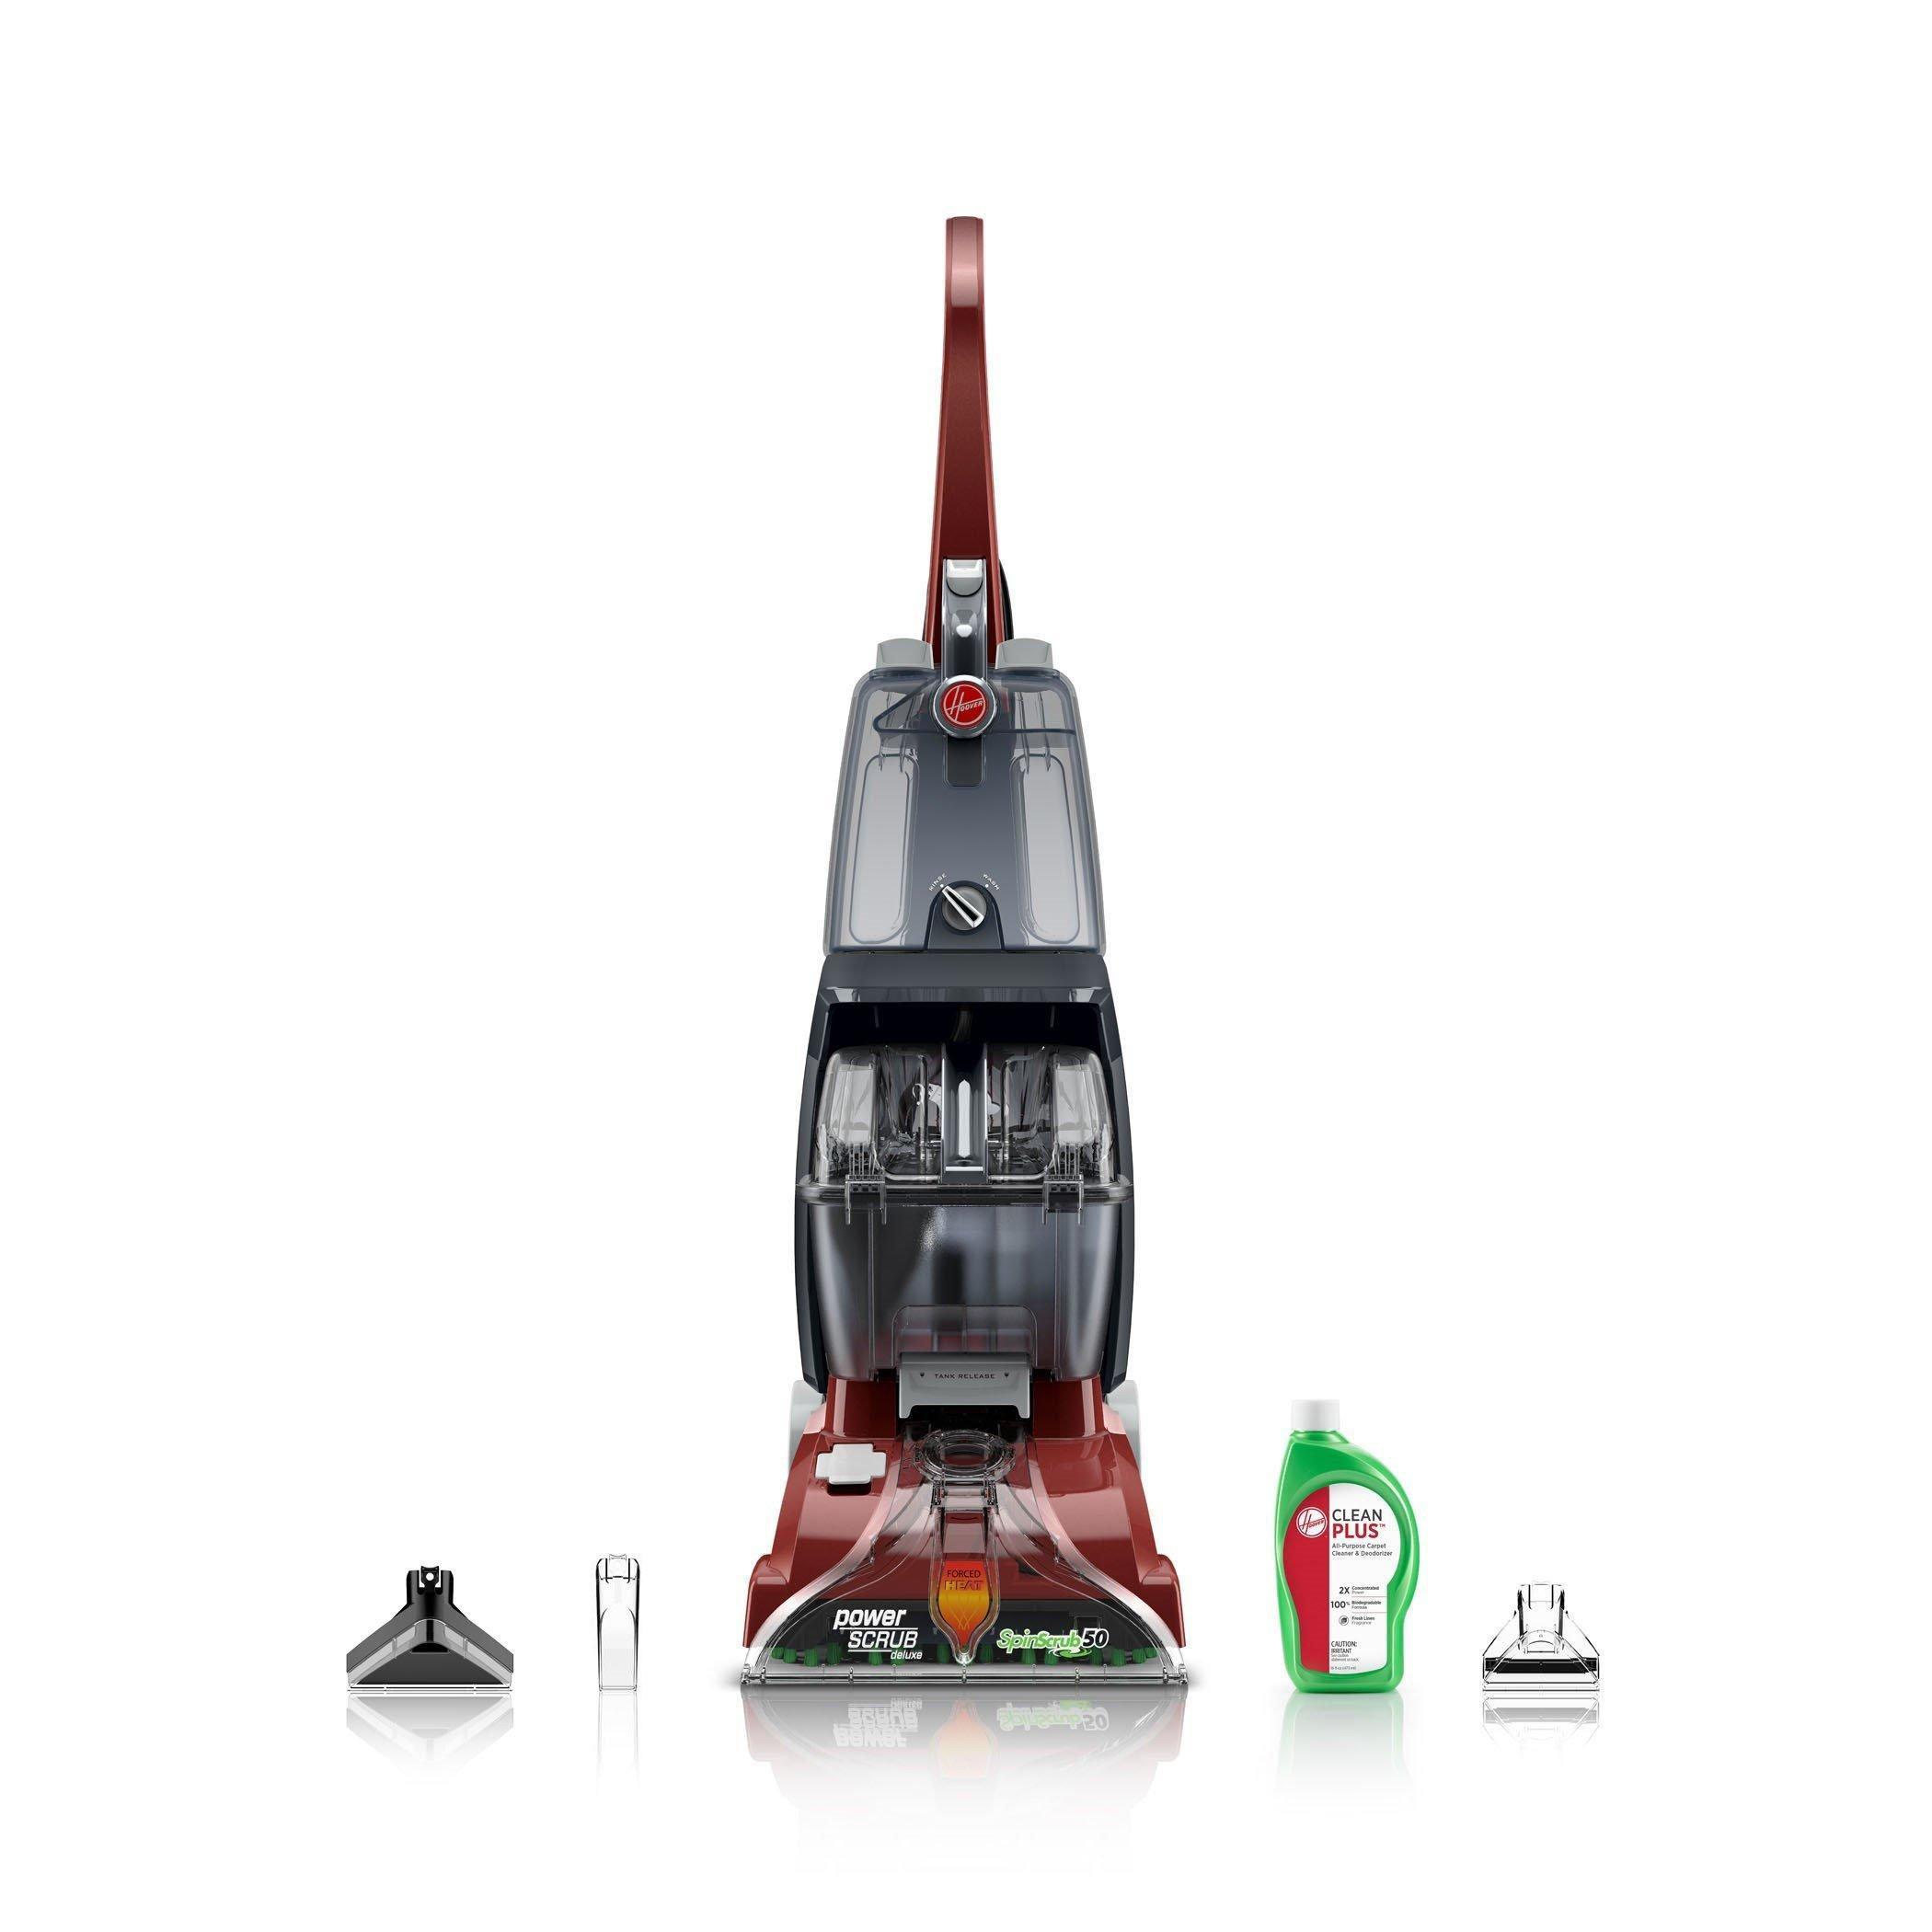 Power Scrub Deluxe Carpet Cleaner1